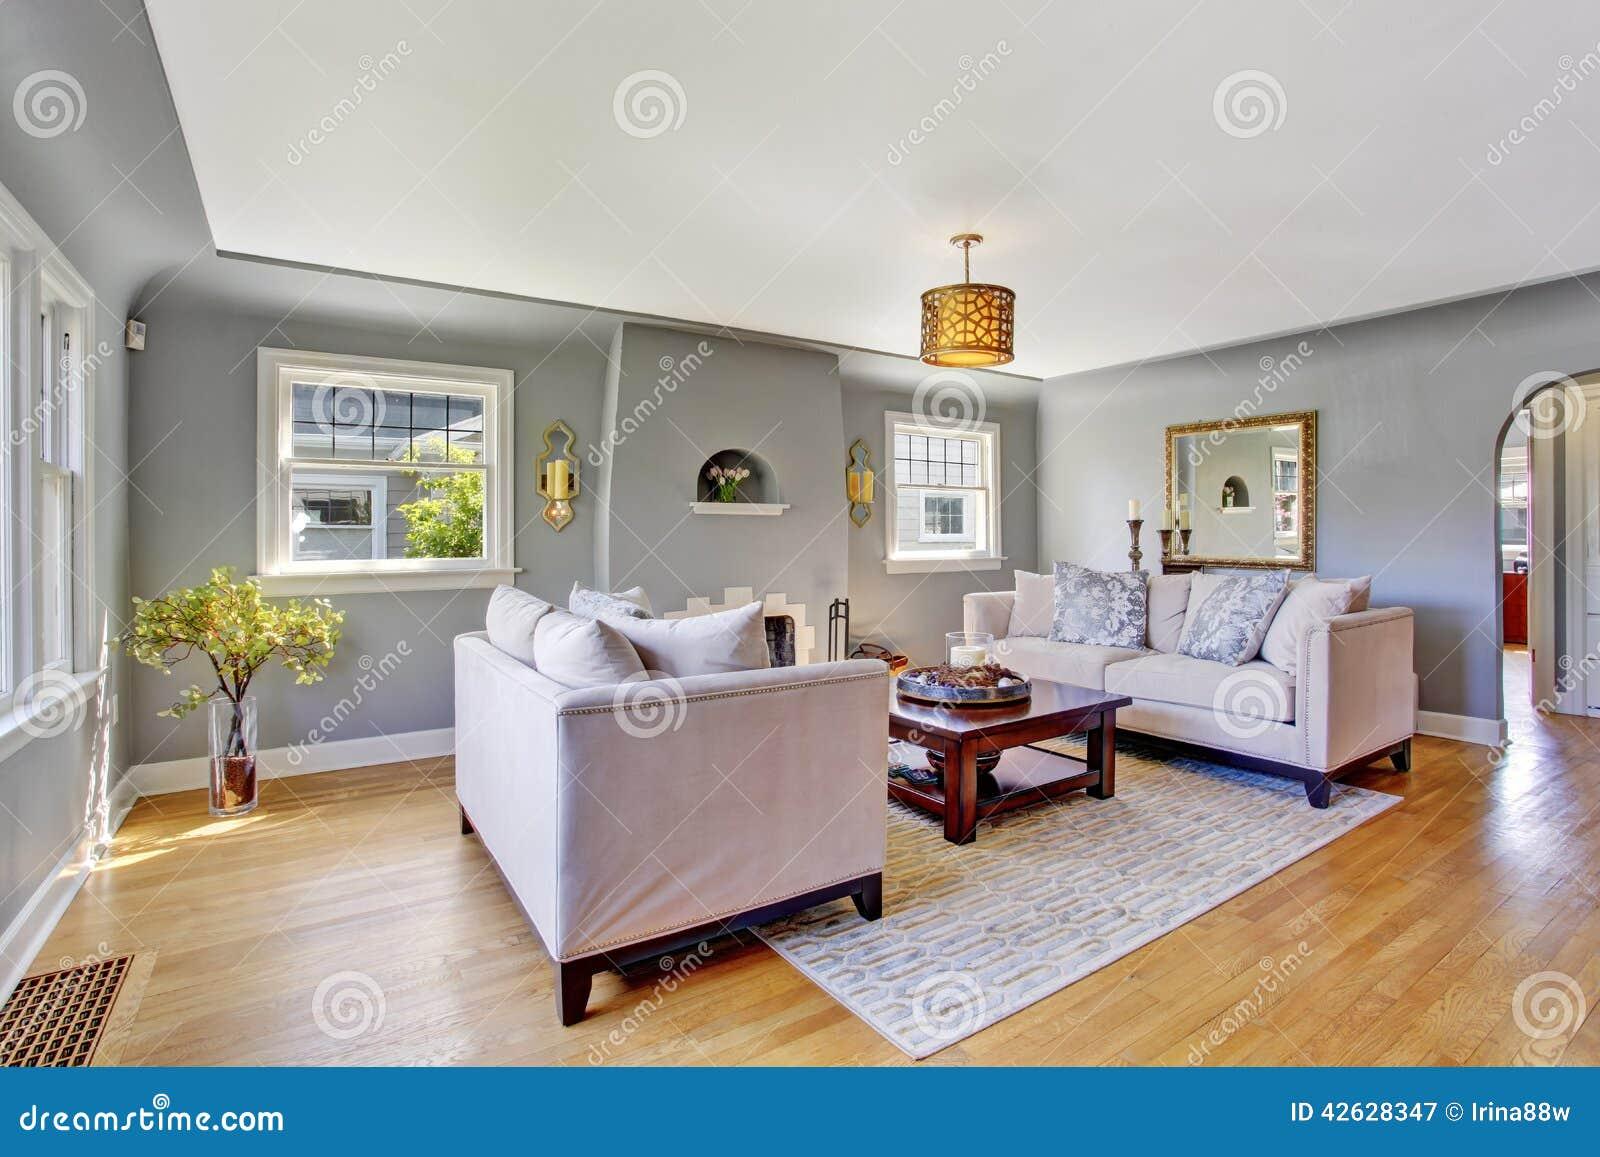 Light grey living room with white sofas stock photo image 42628347 - Light gray room ...